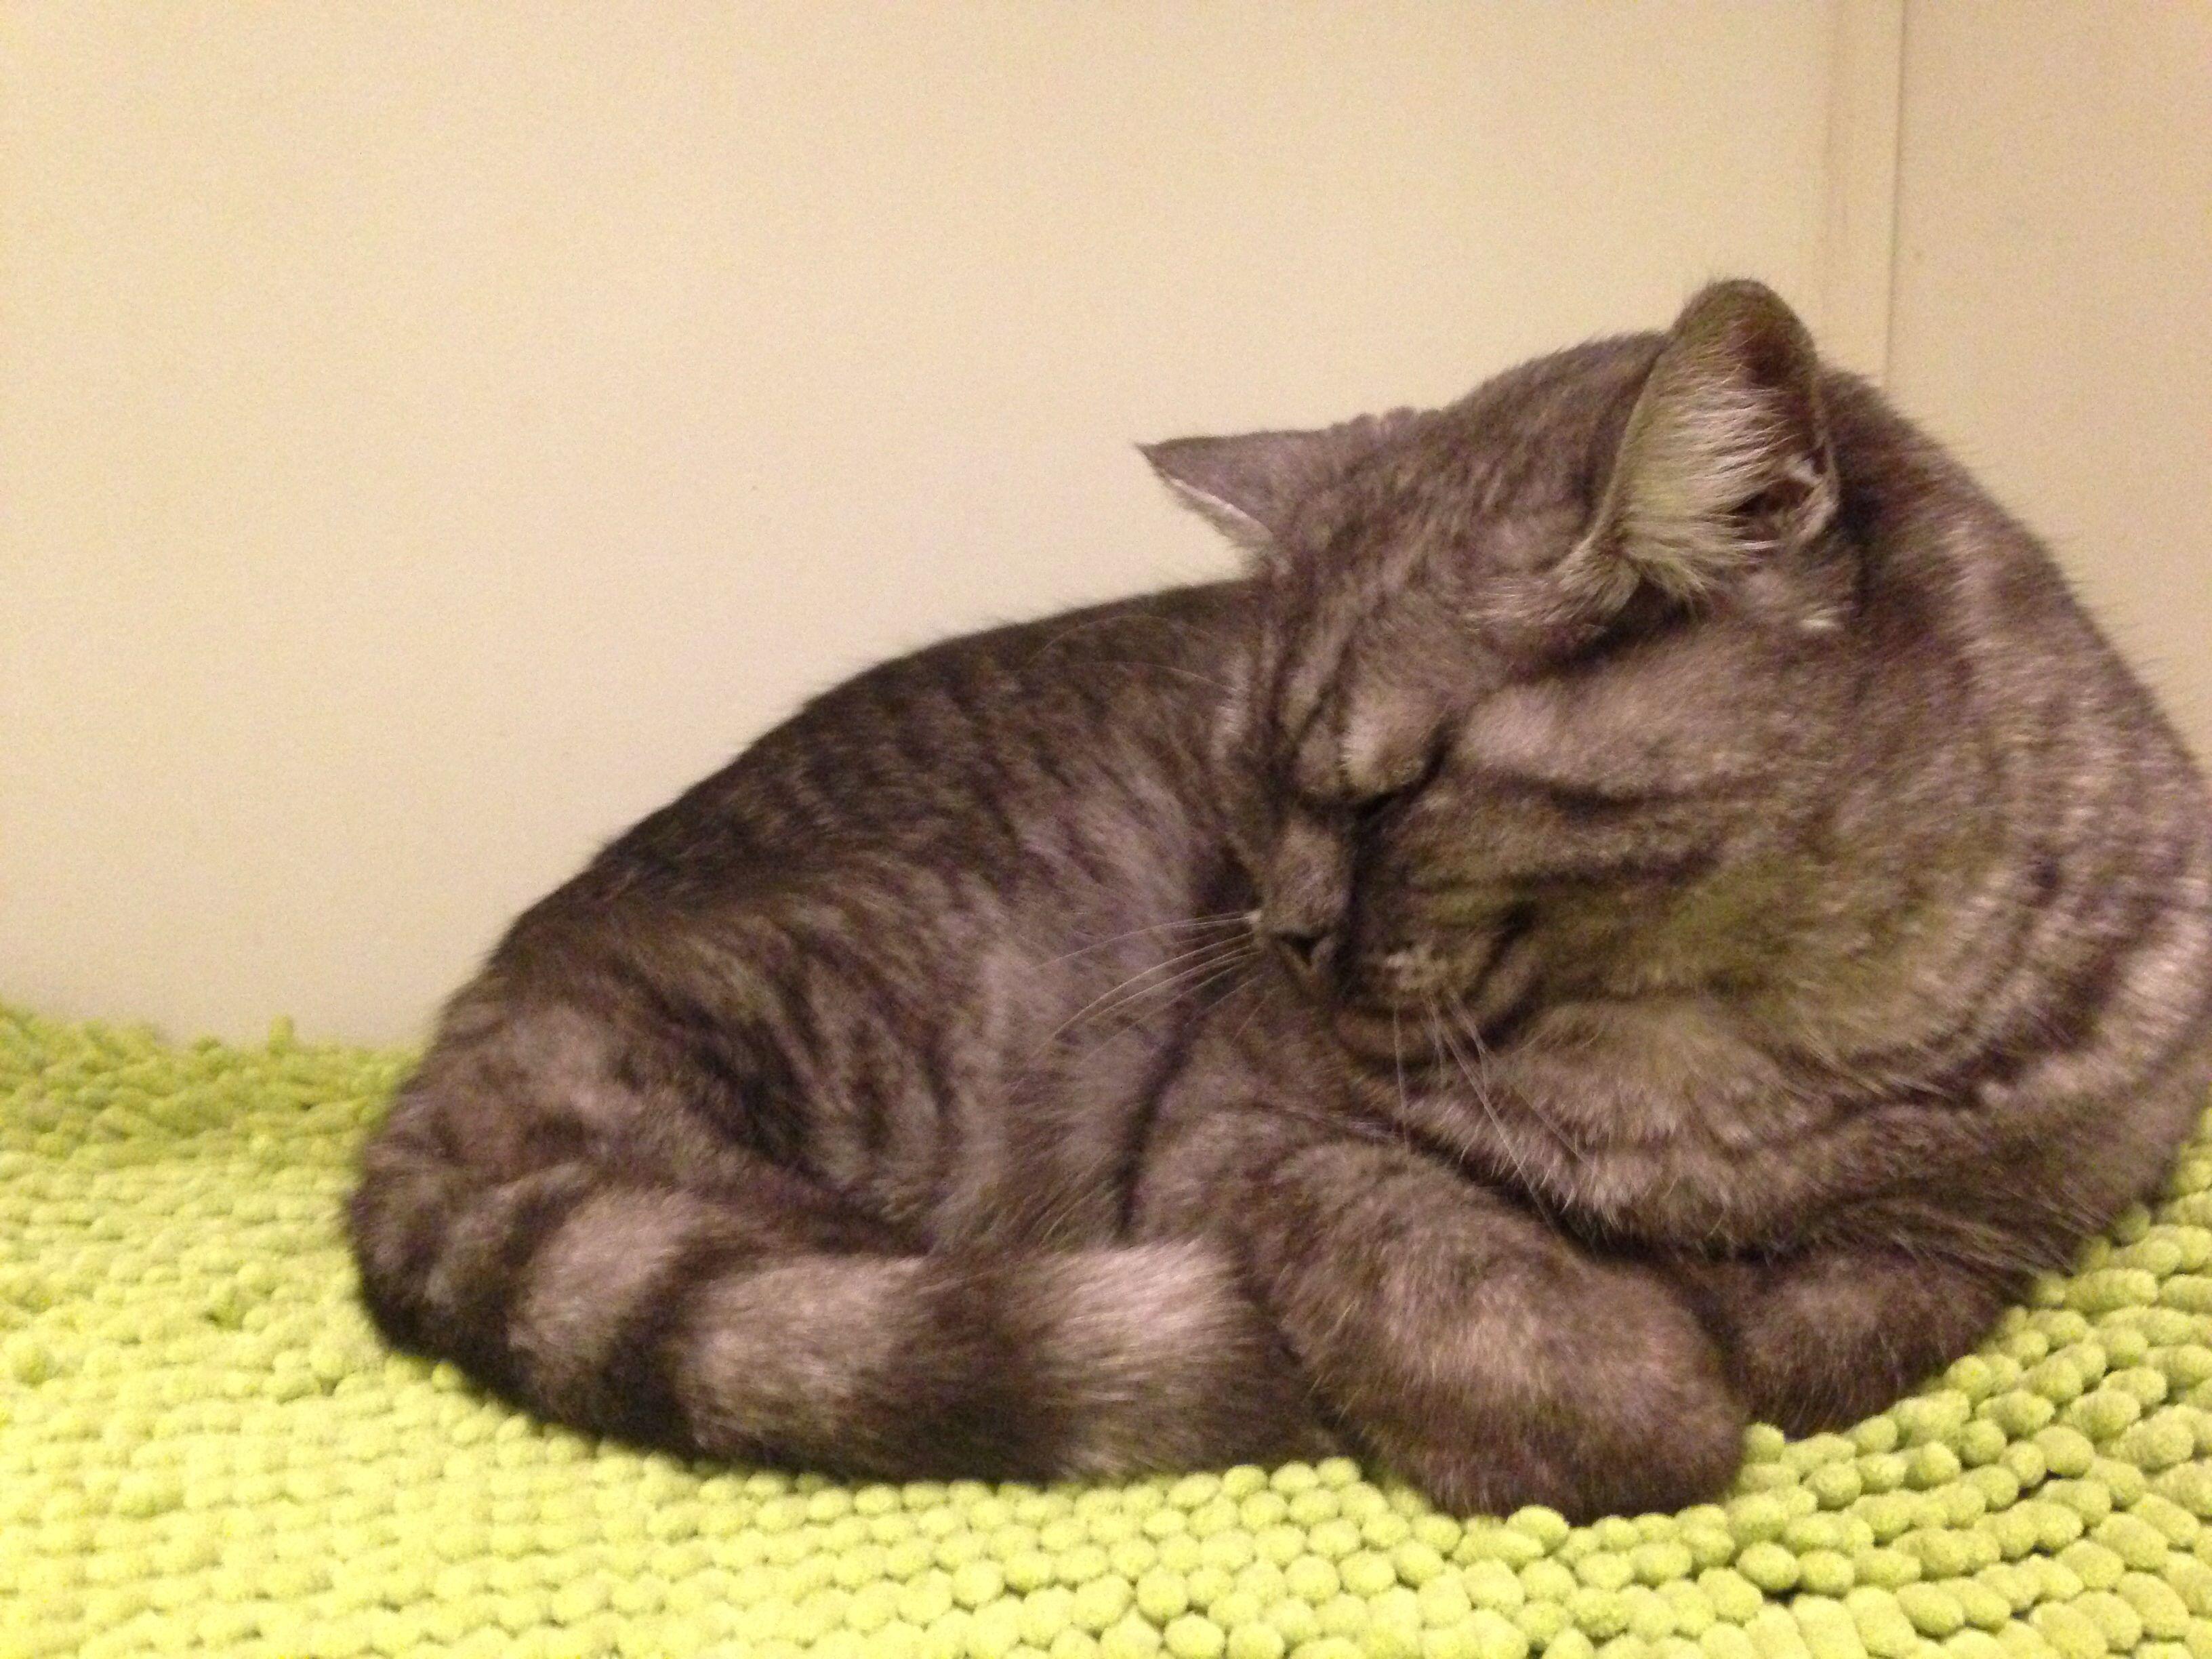 Helmut Is A British Shorthair Cat Black Silver Mackerel Tabby British Shorthair Cats Tabby Cat British Shorthair Kittens